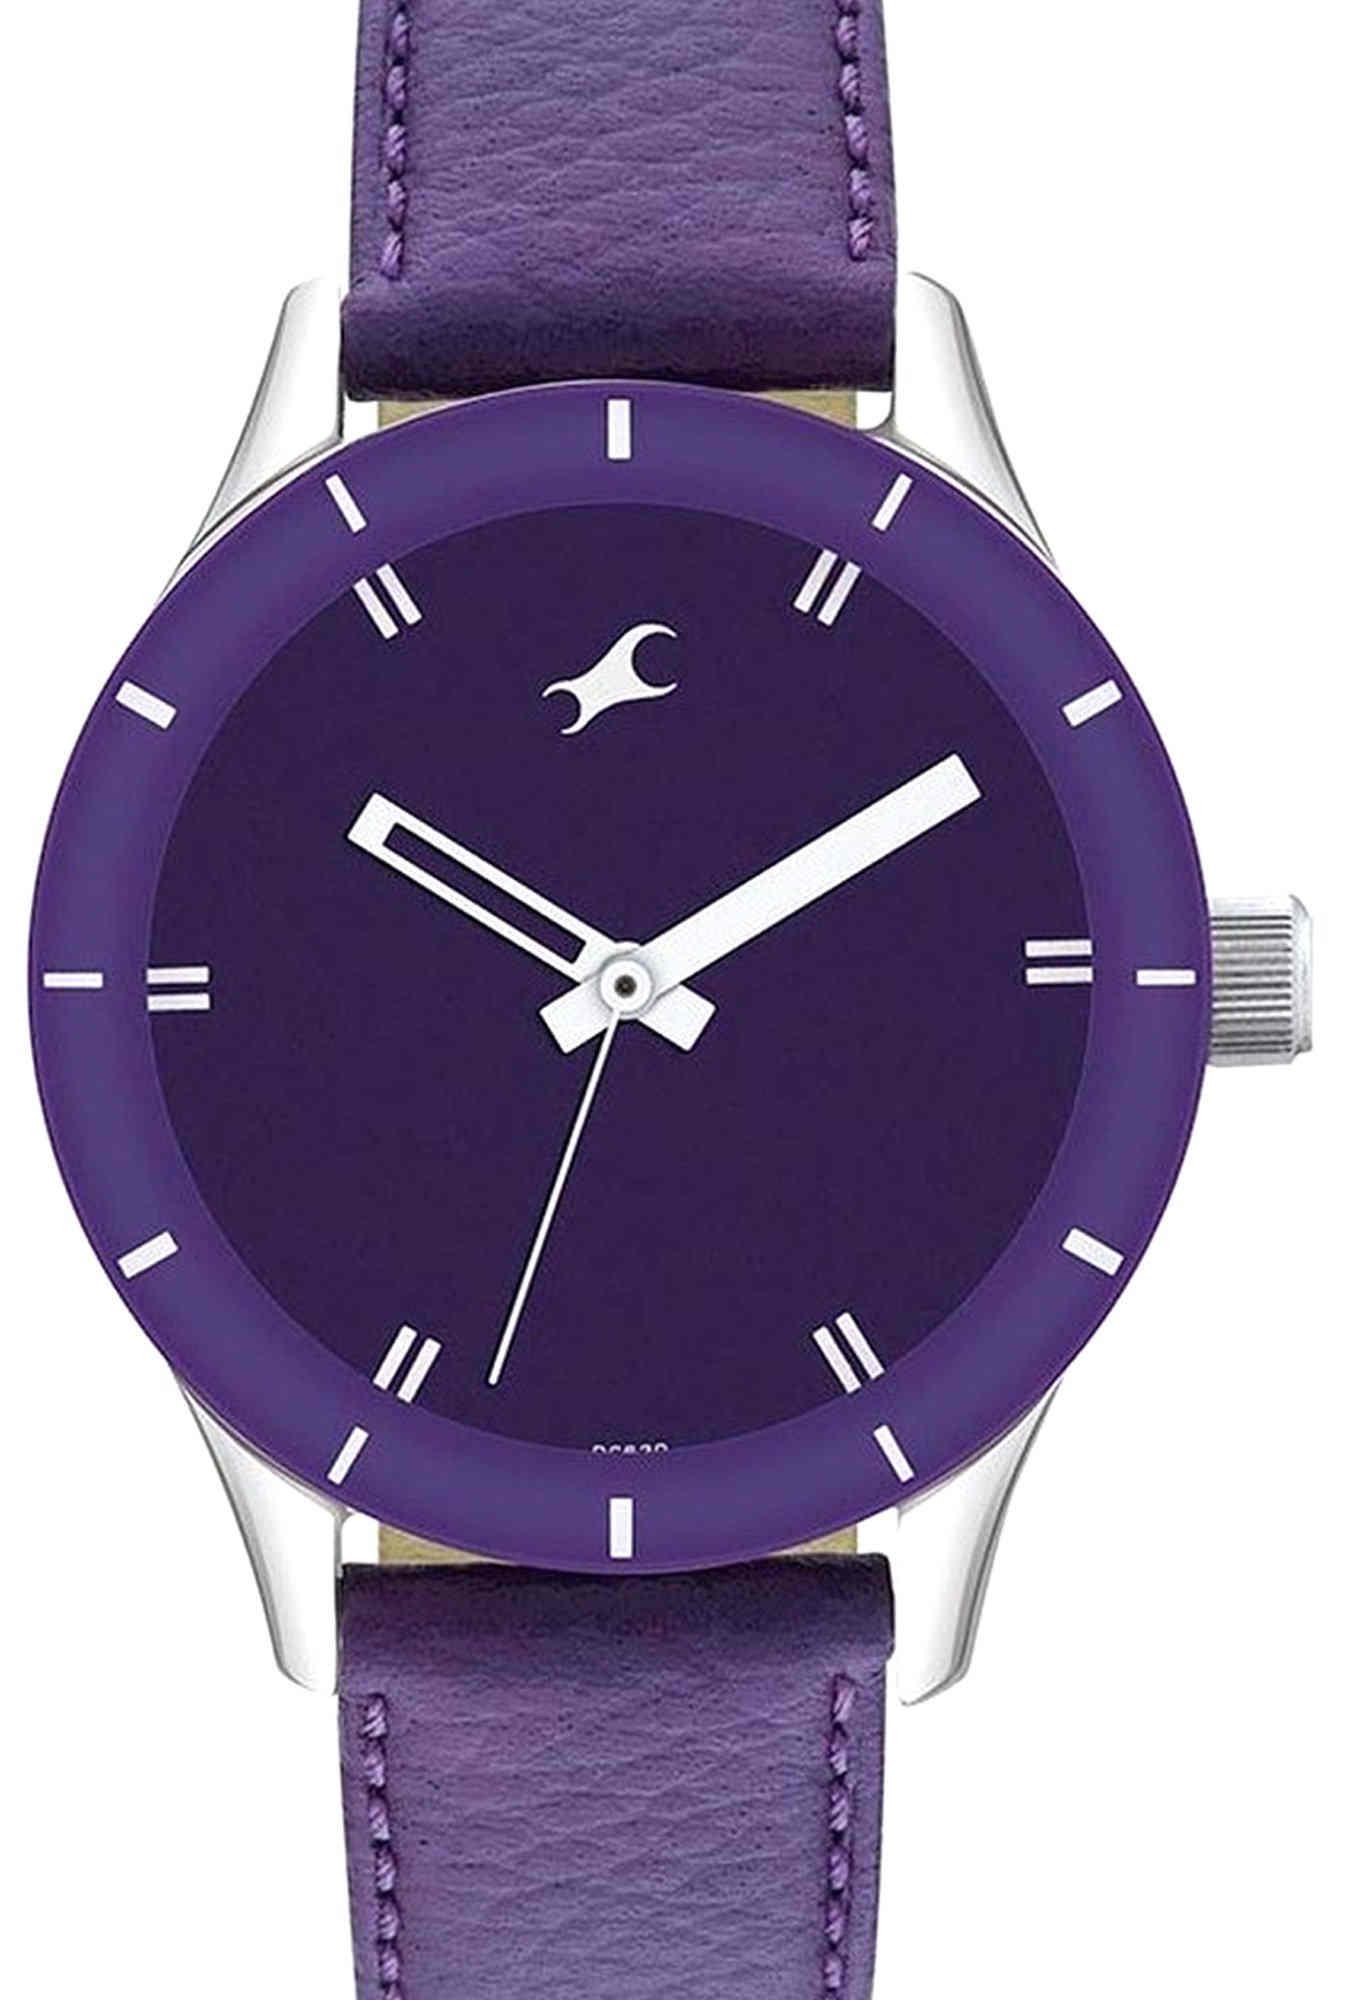 Fastrack 6078SL05 Monochrome Analog Women's Watch